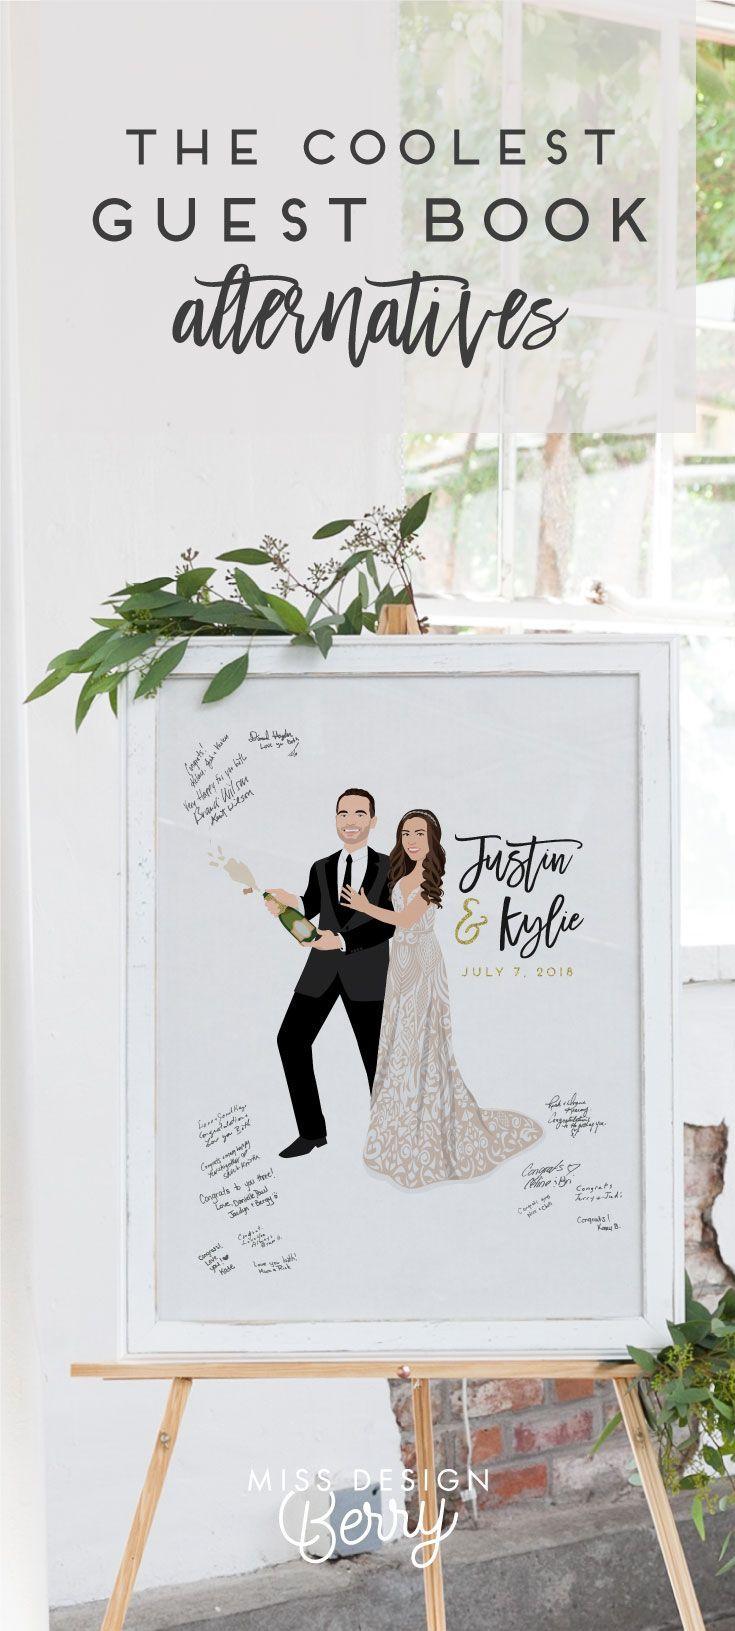 Miss Design Berry | Unique Wedding Guest Book Alternatives